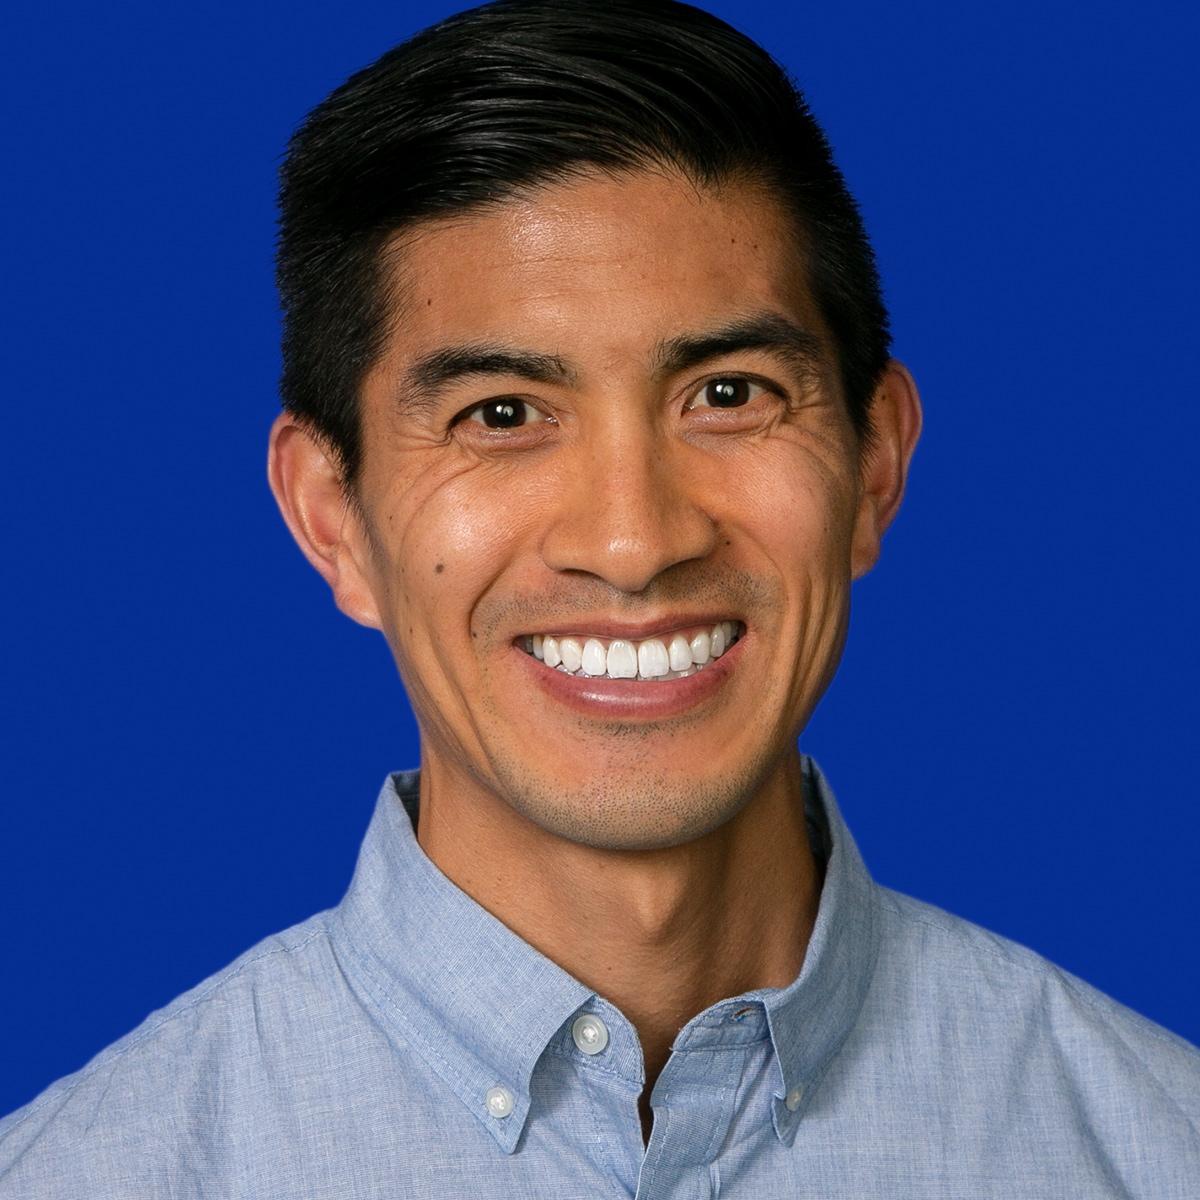 Headshot photo of Bryan Fong